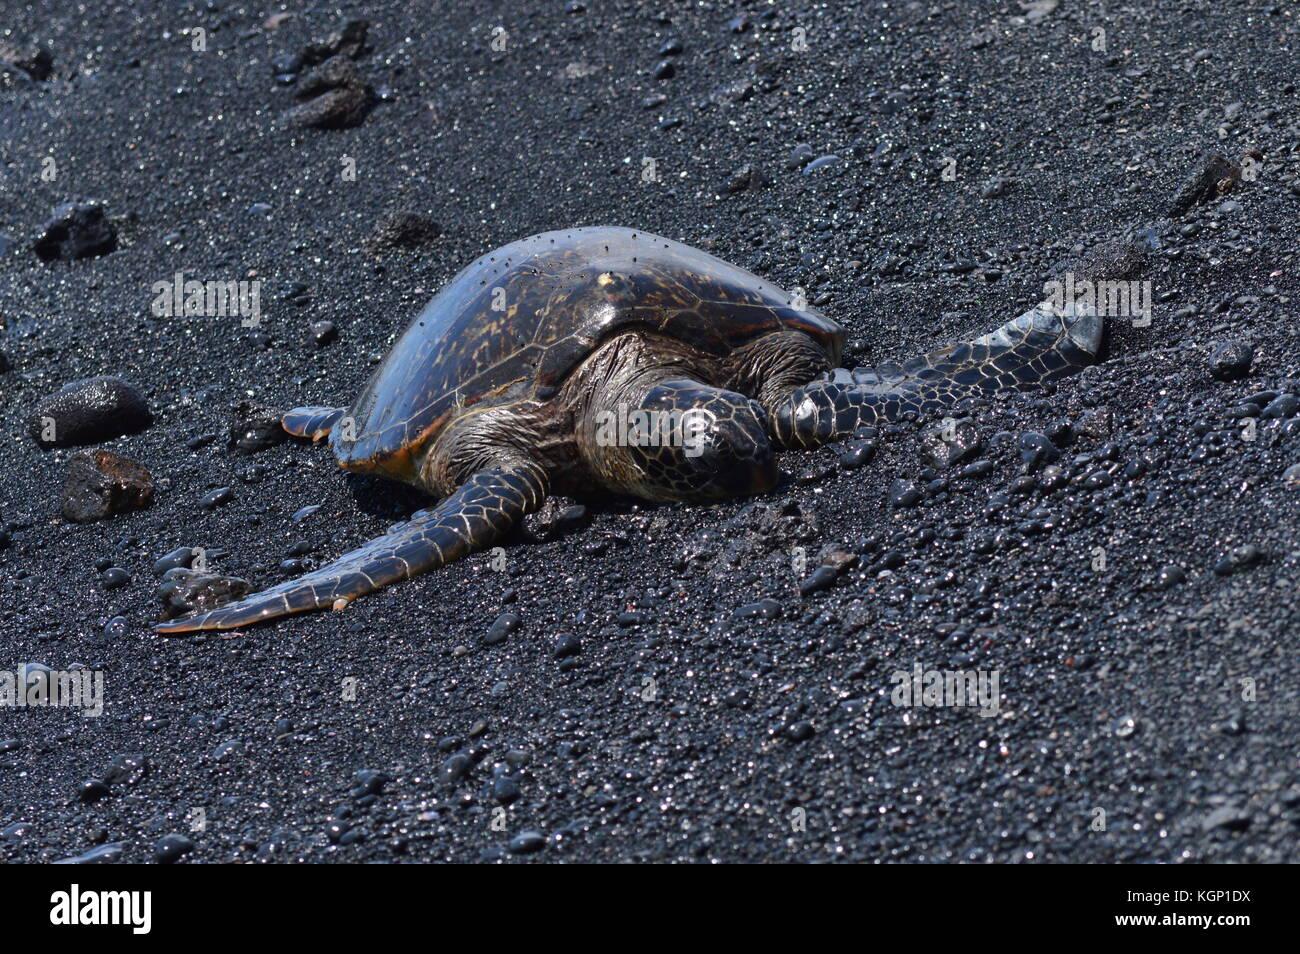 Turtles On A Black Sand Beach In Hawaii Stock Photo